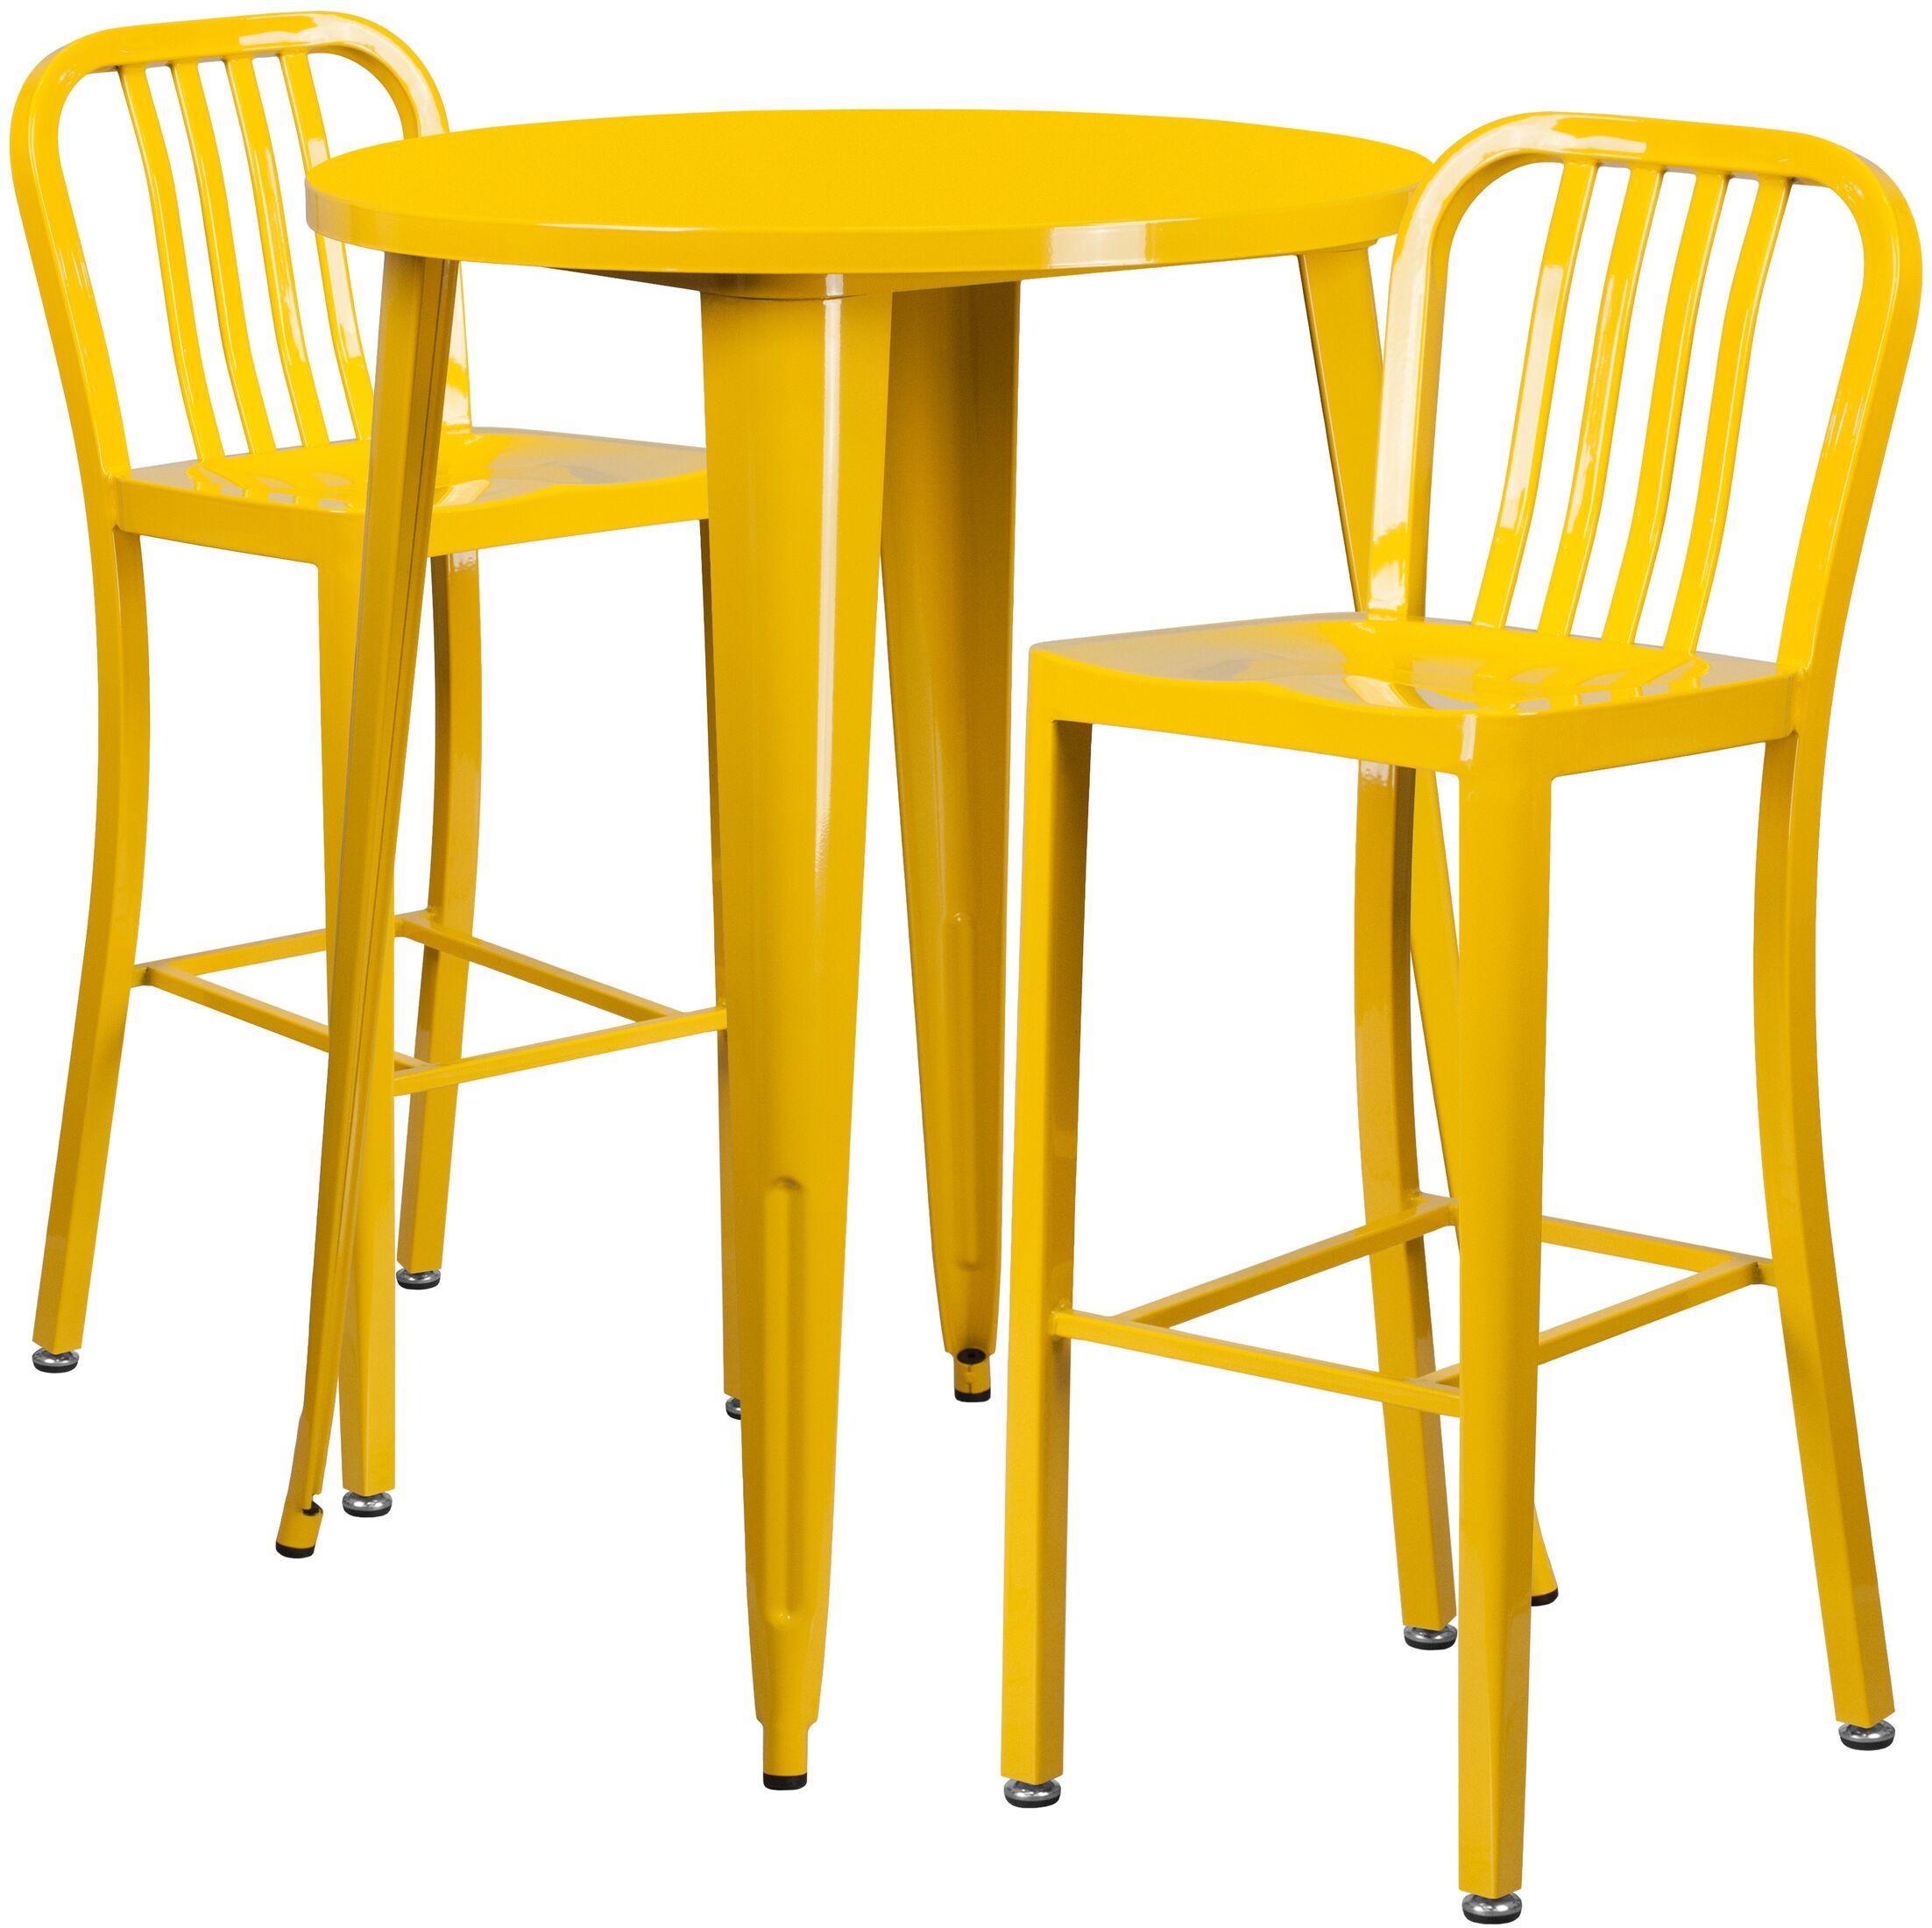 Avera 3 Piece Bar Height Dining Set Finish: Yellow